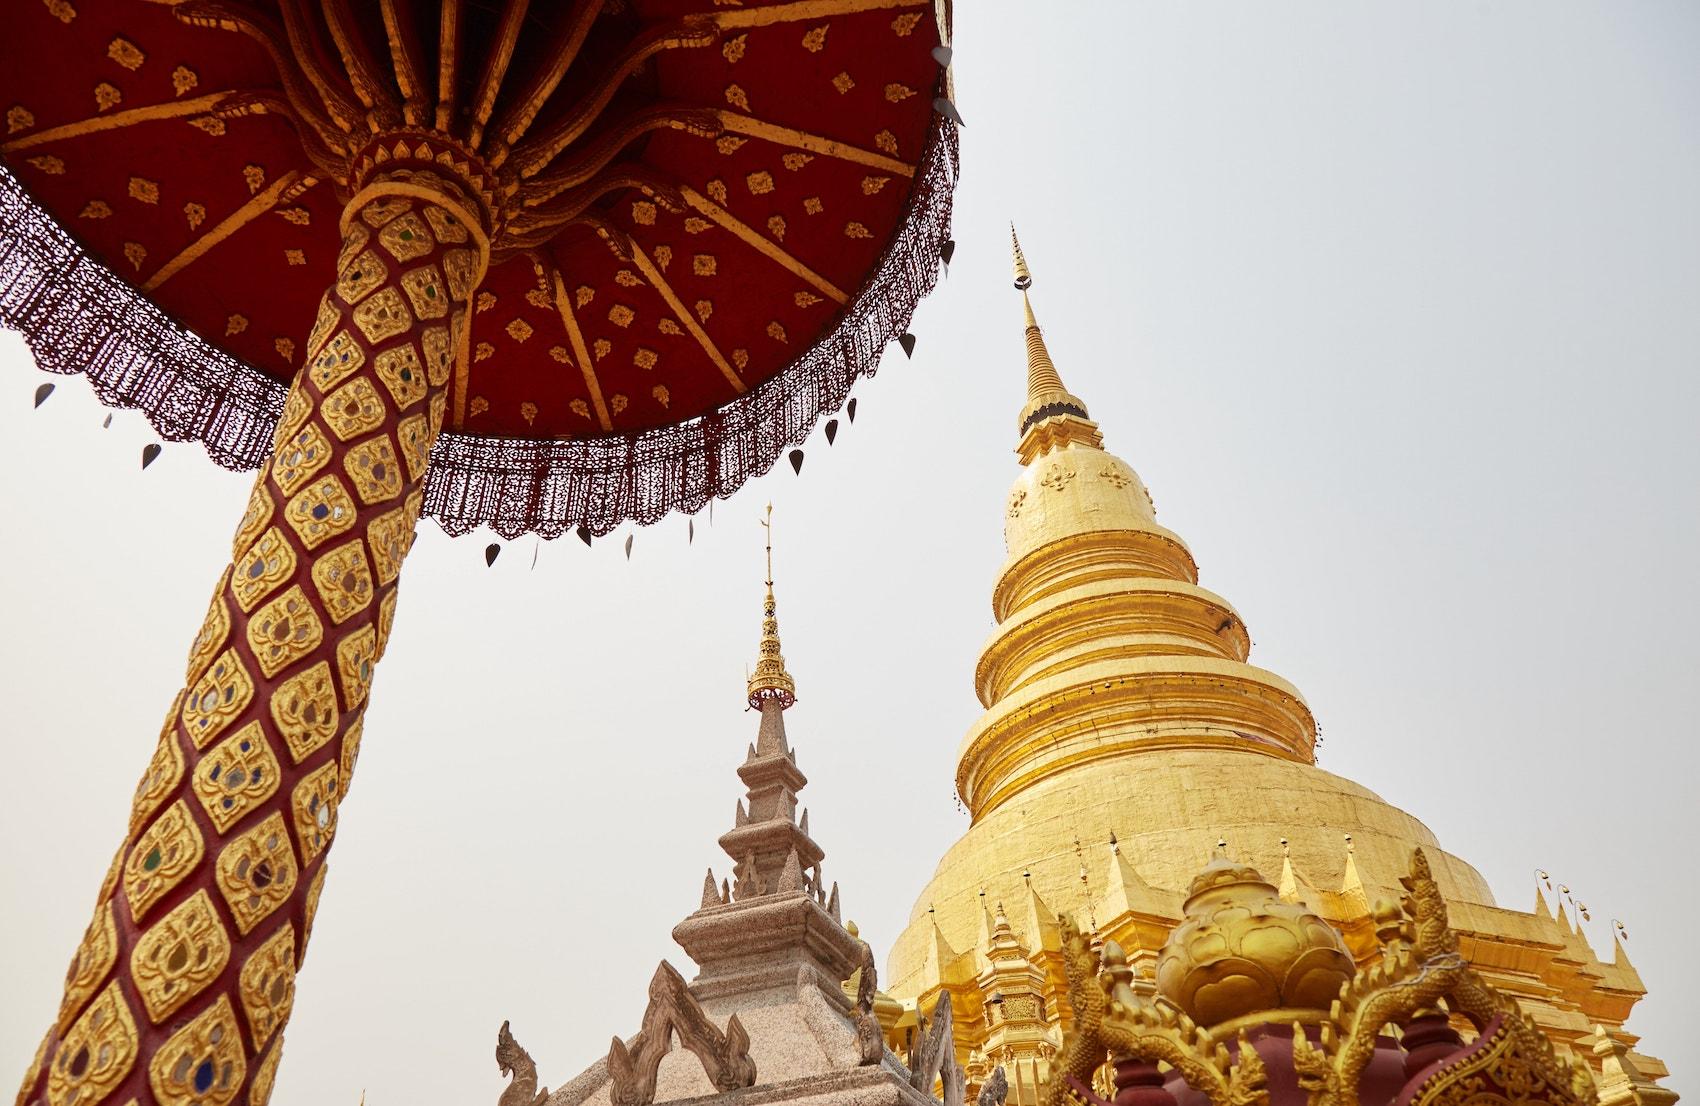 Phra That Haripunchai